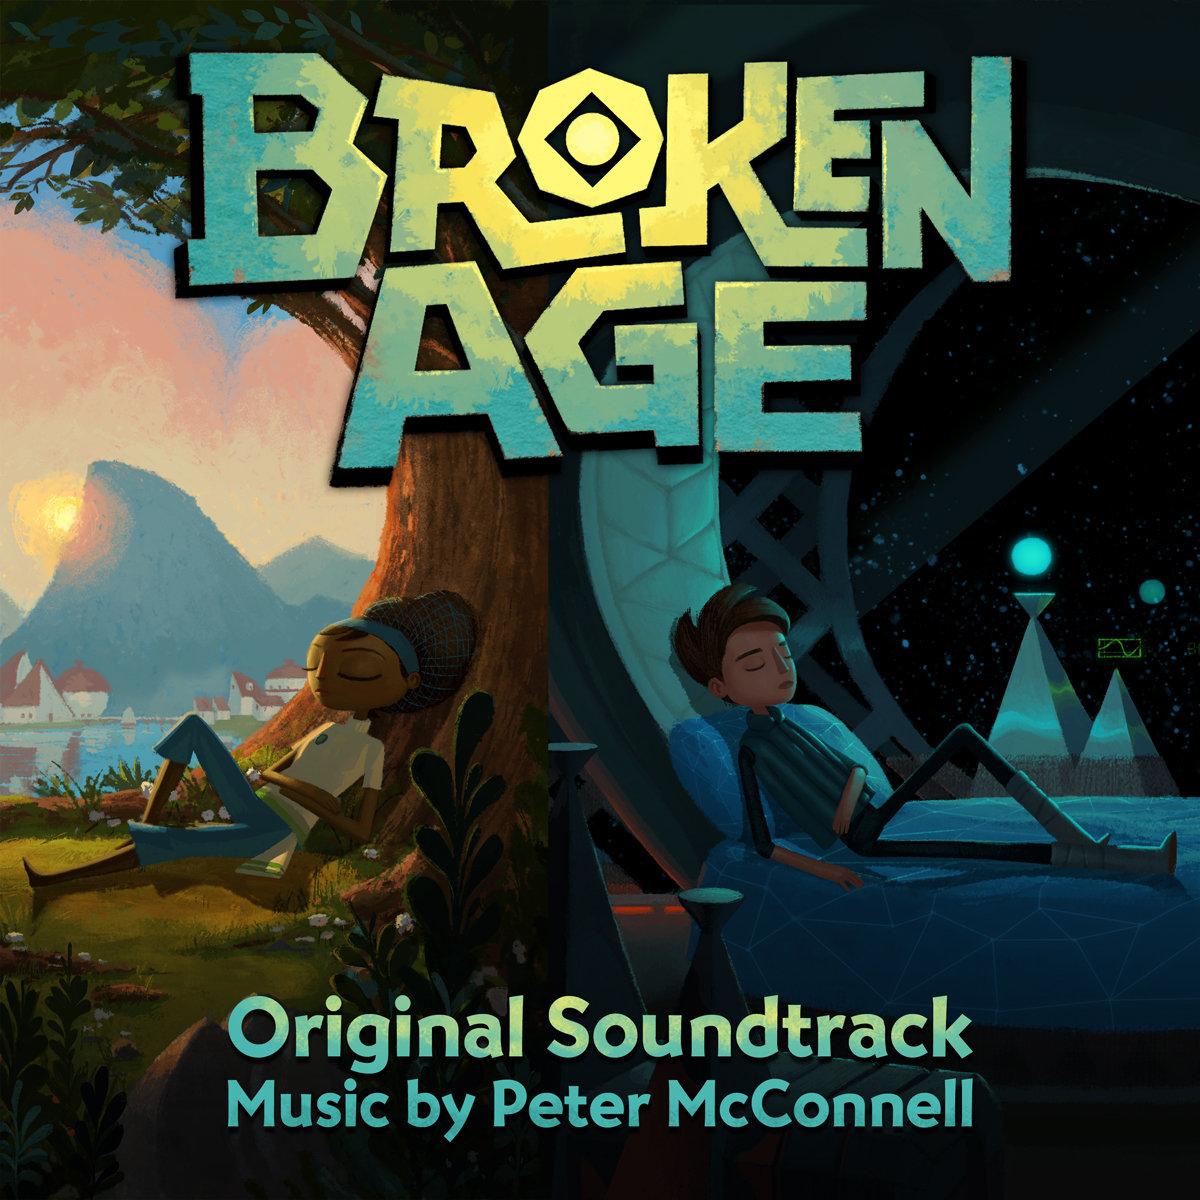 Broken Age: Original Soundtrack | Double Fine Productions